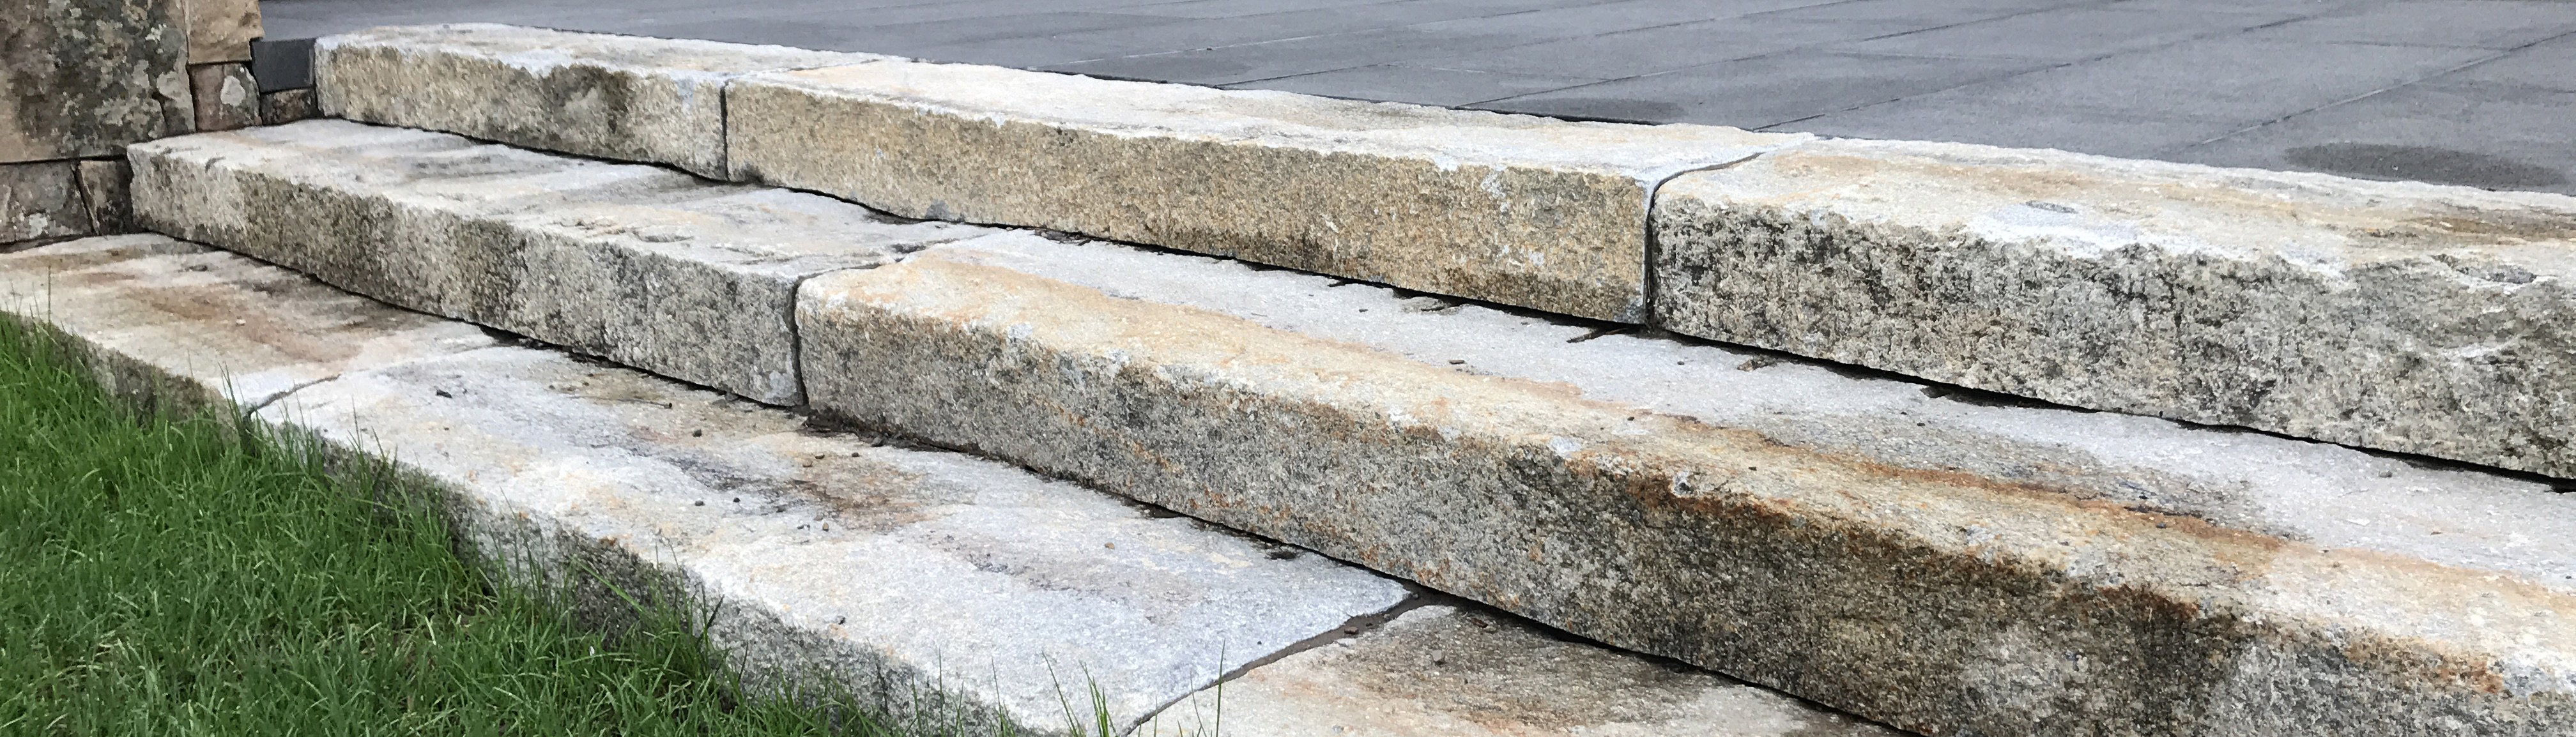 Reclaimed curbing used as steps